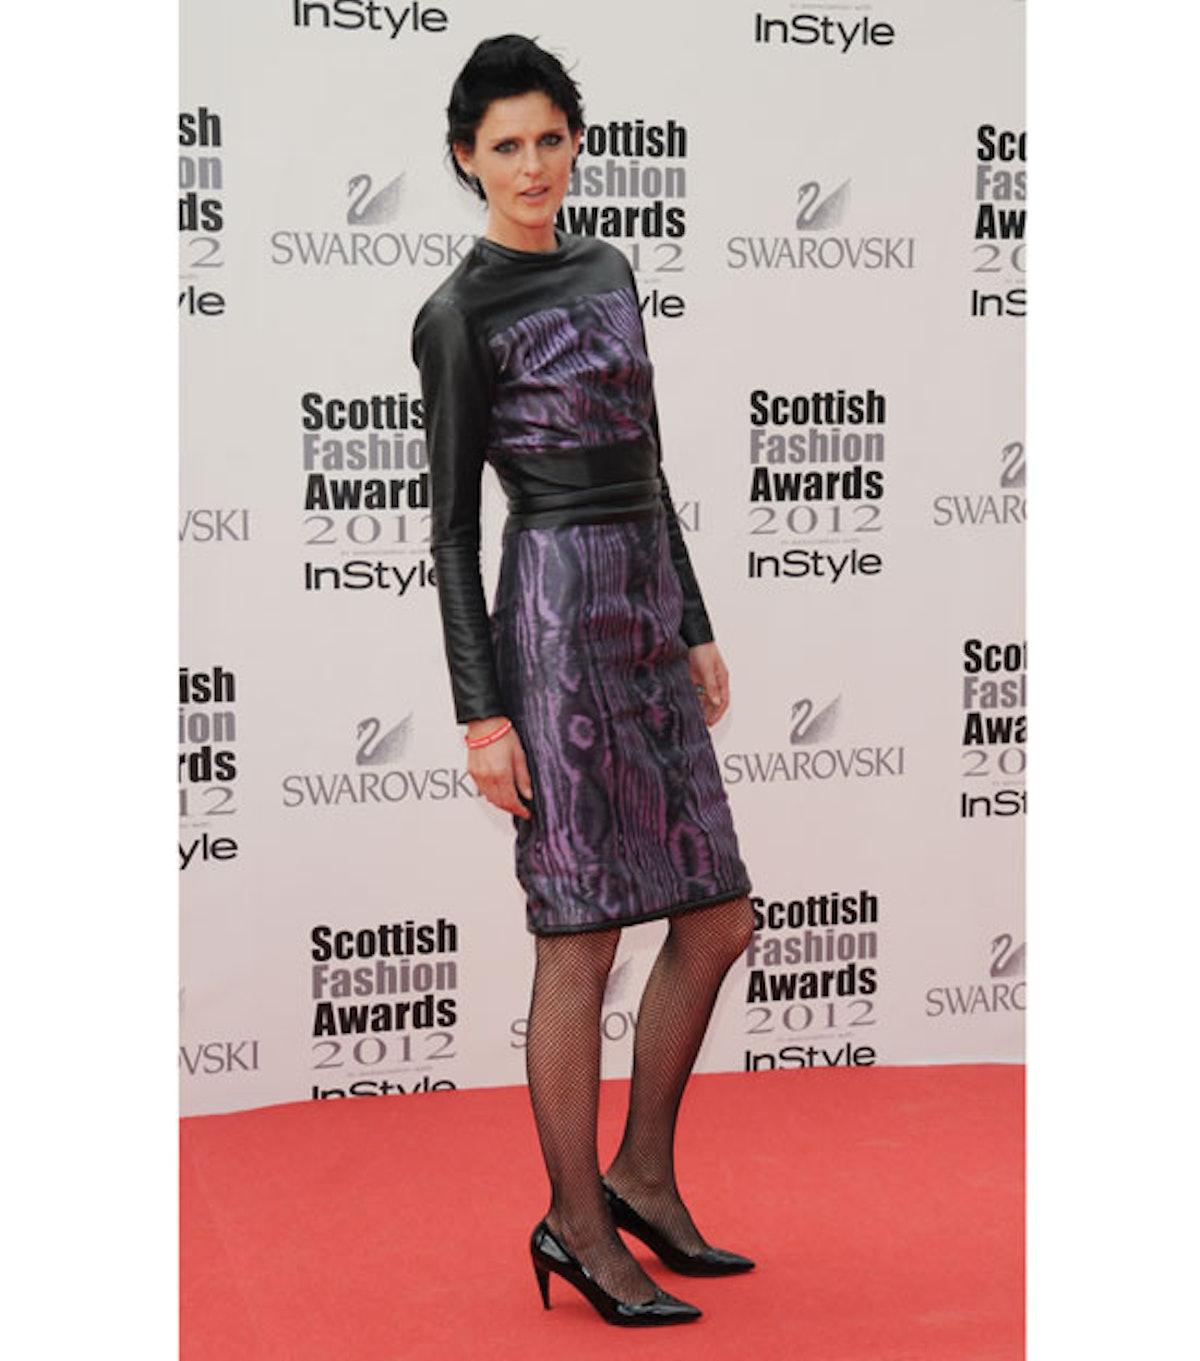 blog-stella-tennant-scottish-fashion-awards.jpg